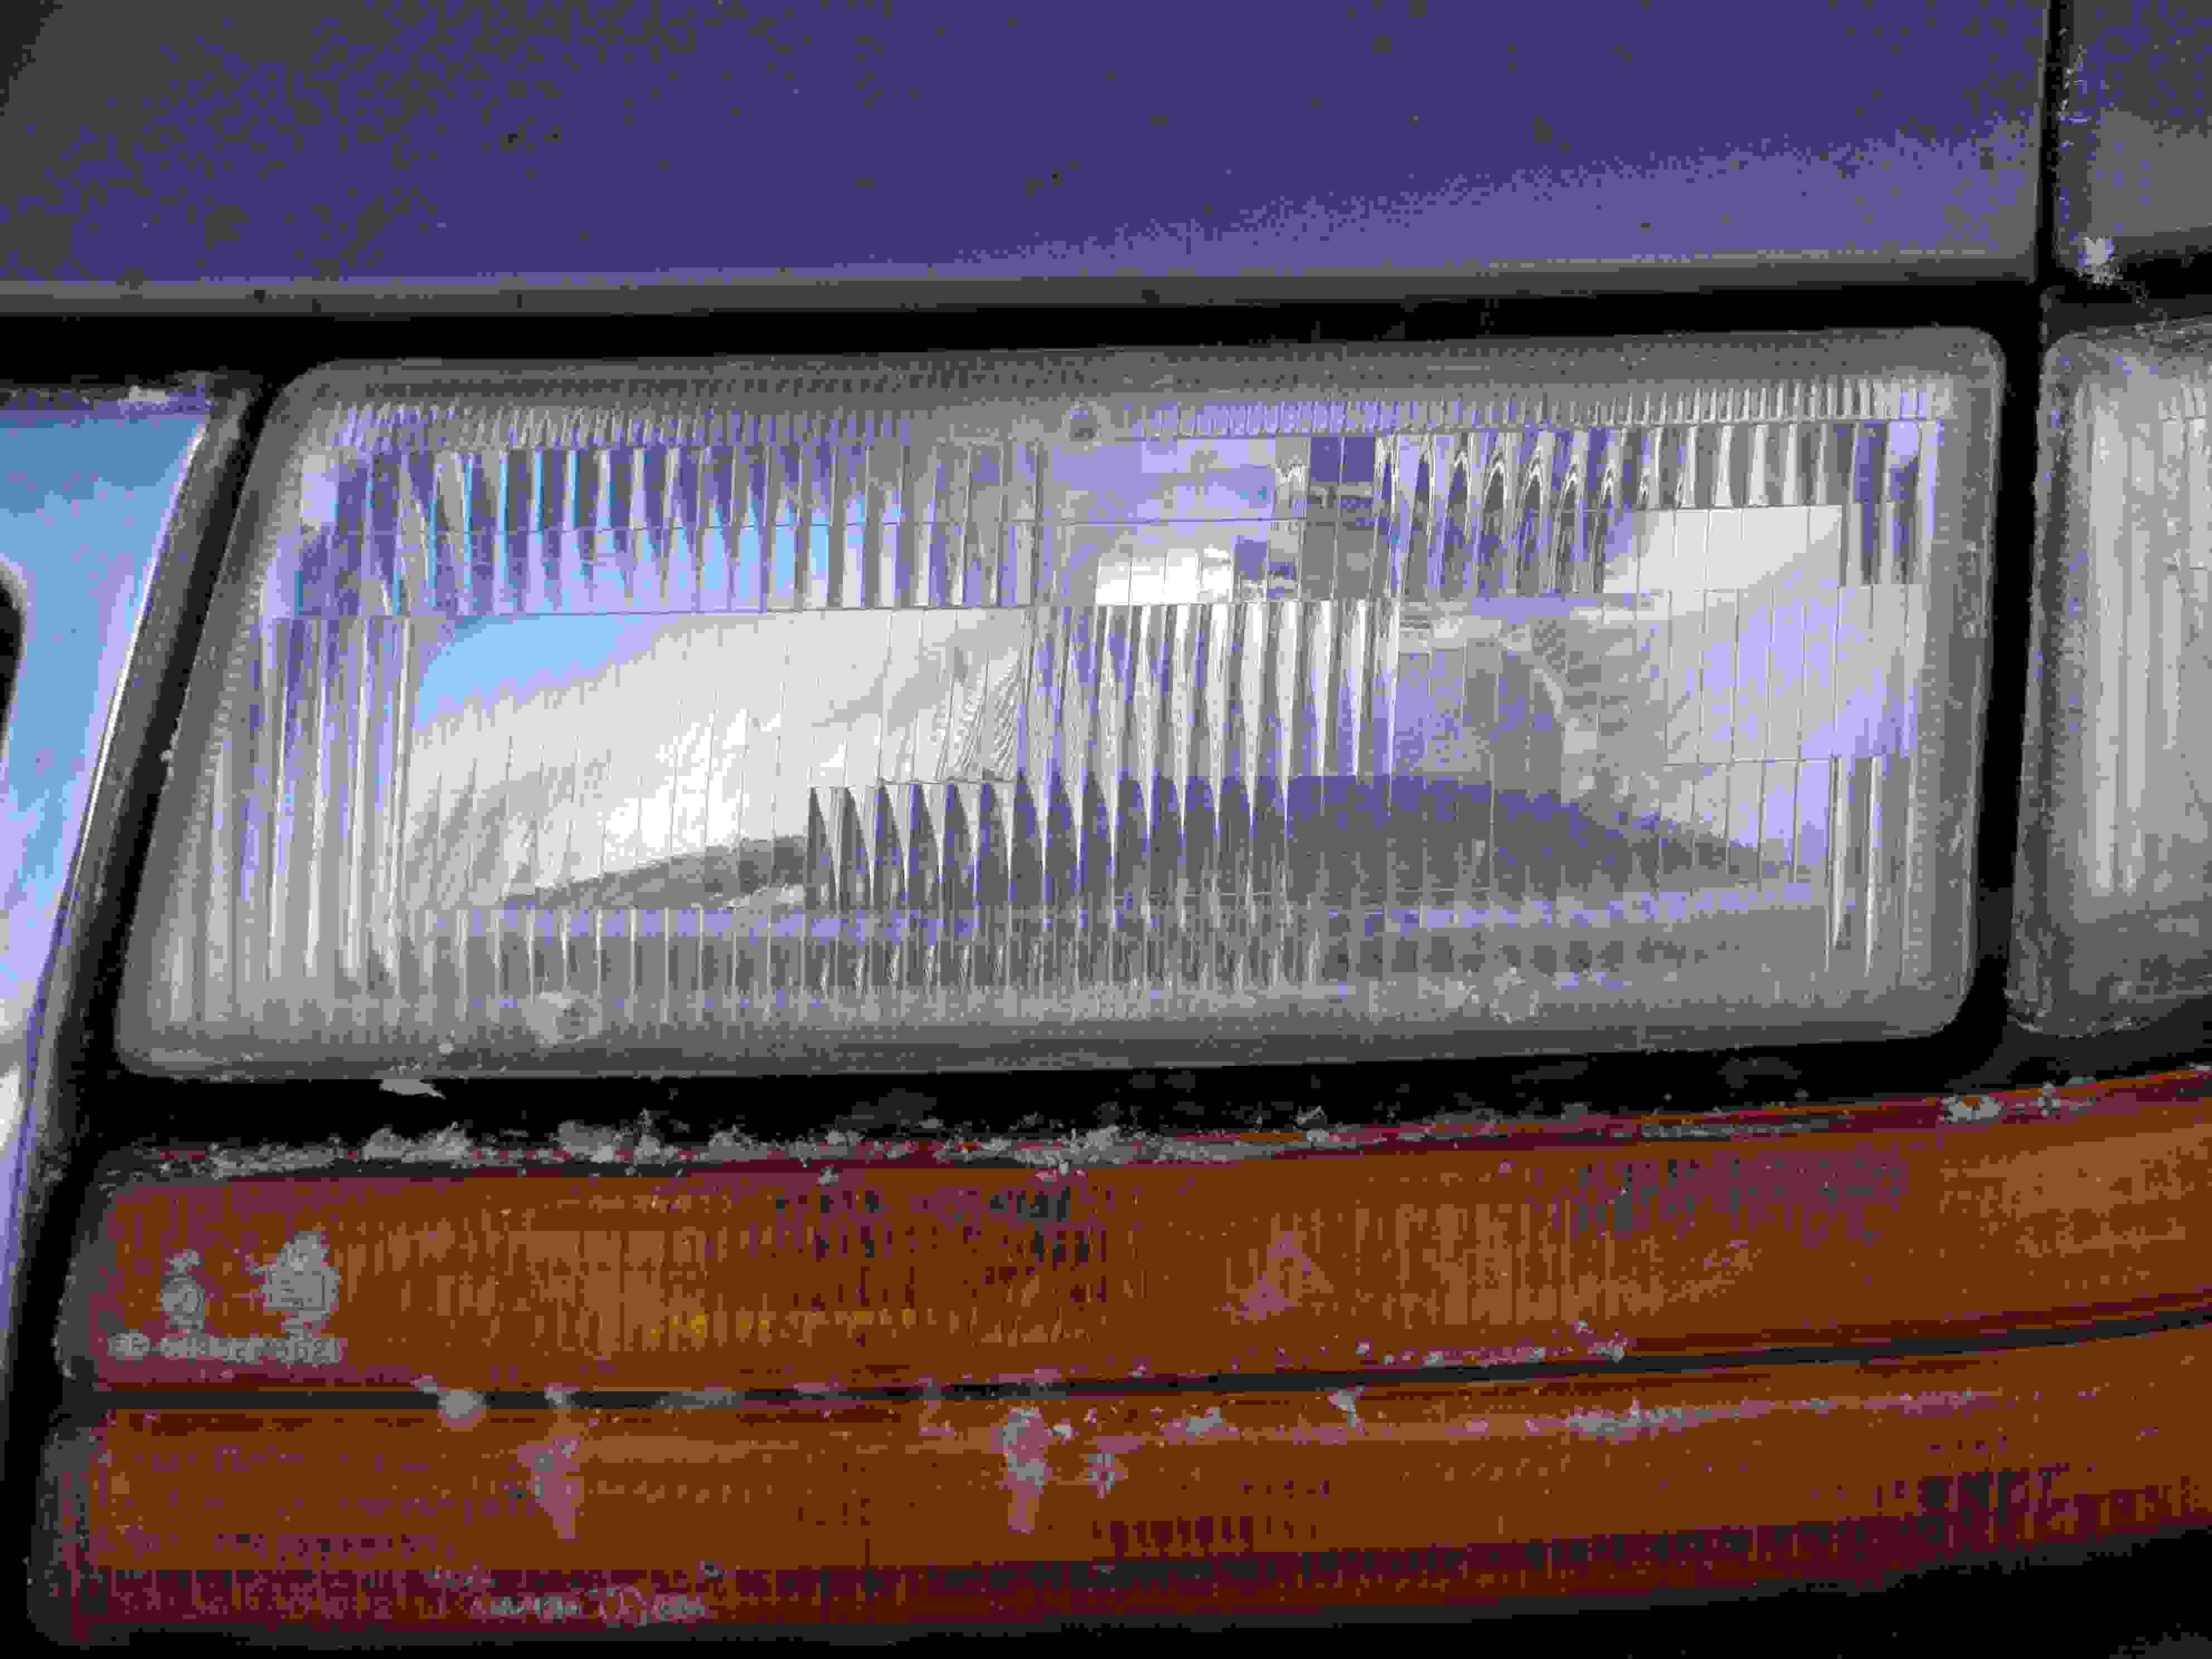 How to remove the haze from your headlight.-headlight-haze-008.jpg